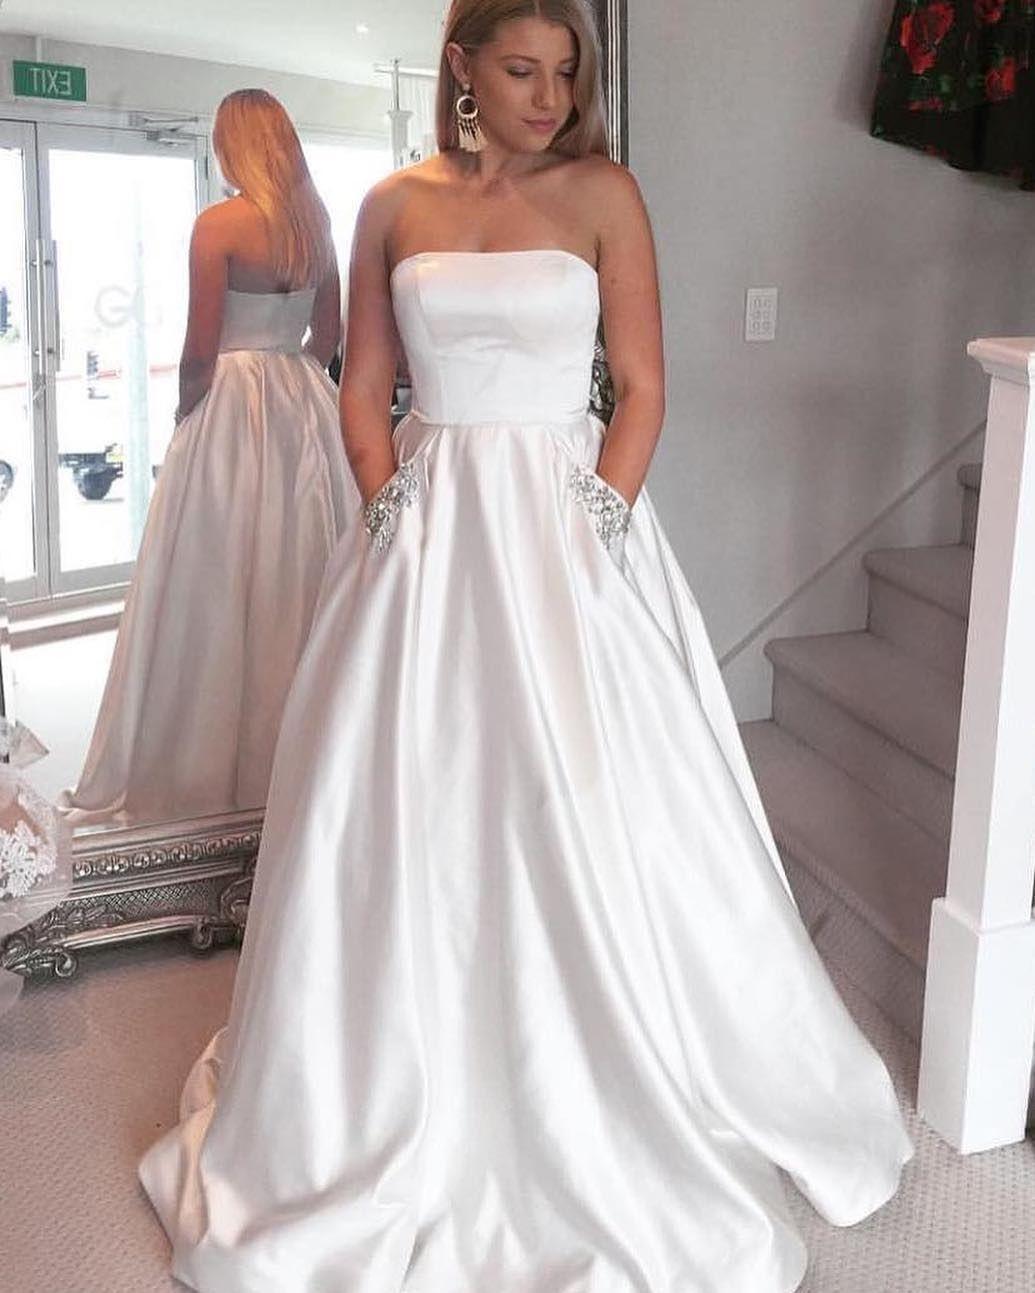 Strapless A Line Satin White Prom Dresses Sparkle Beaded